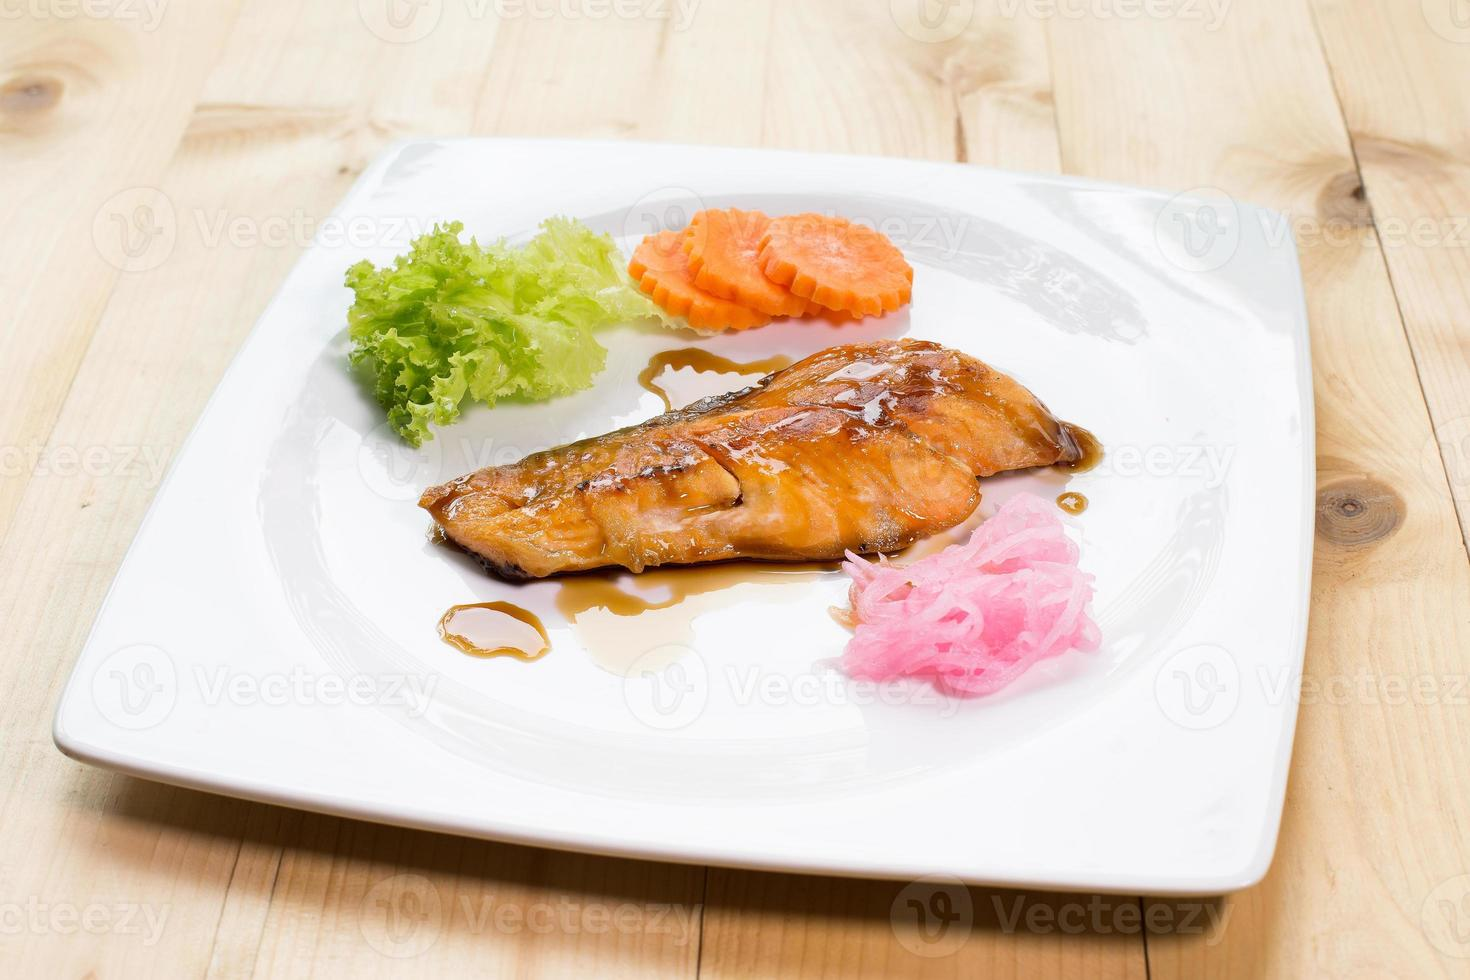 saumon rôti manger avec sauce kabayaki nourriture japonaise, photo